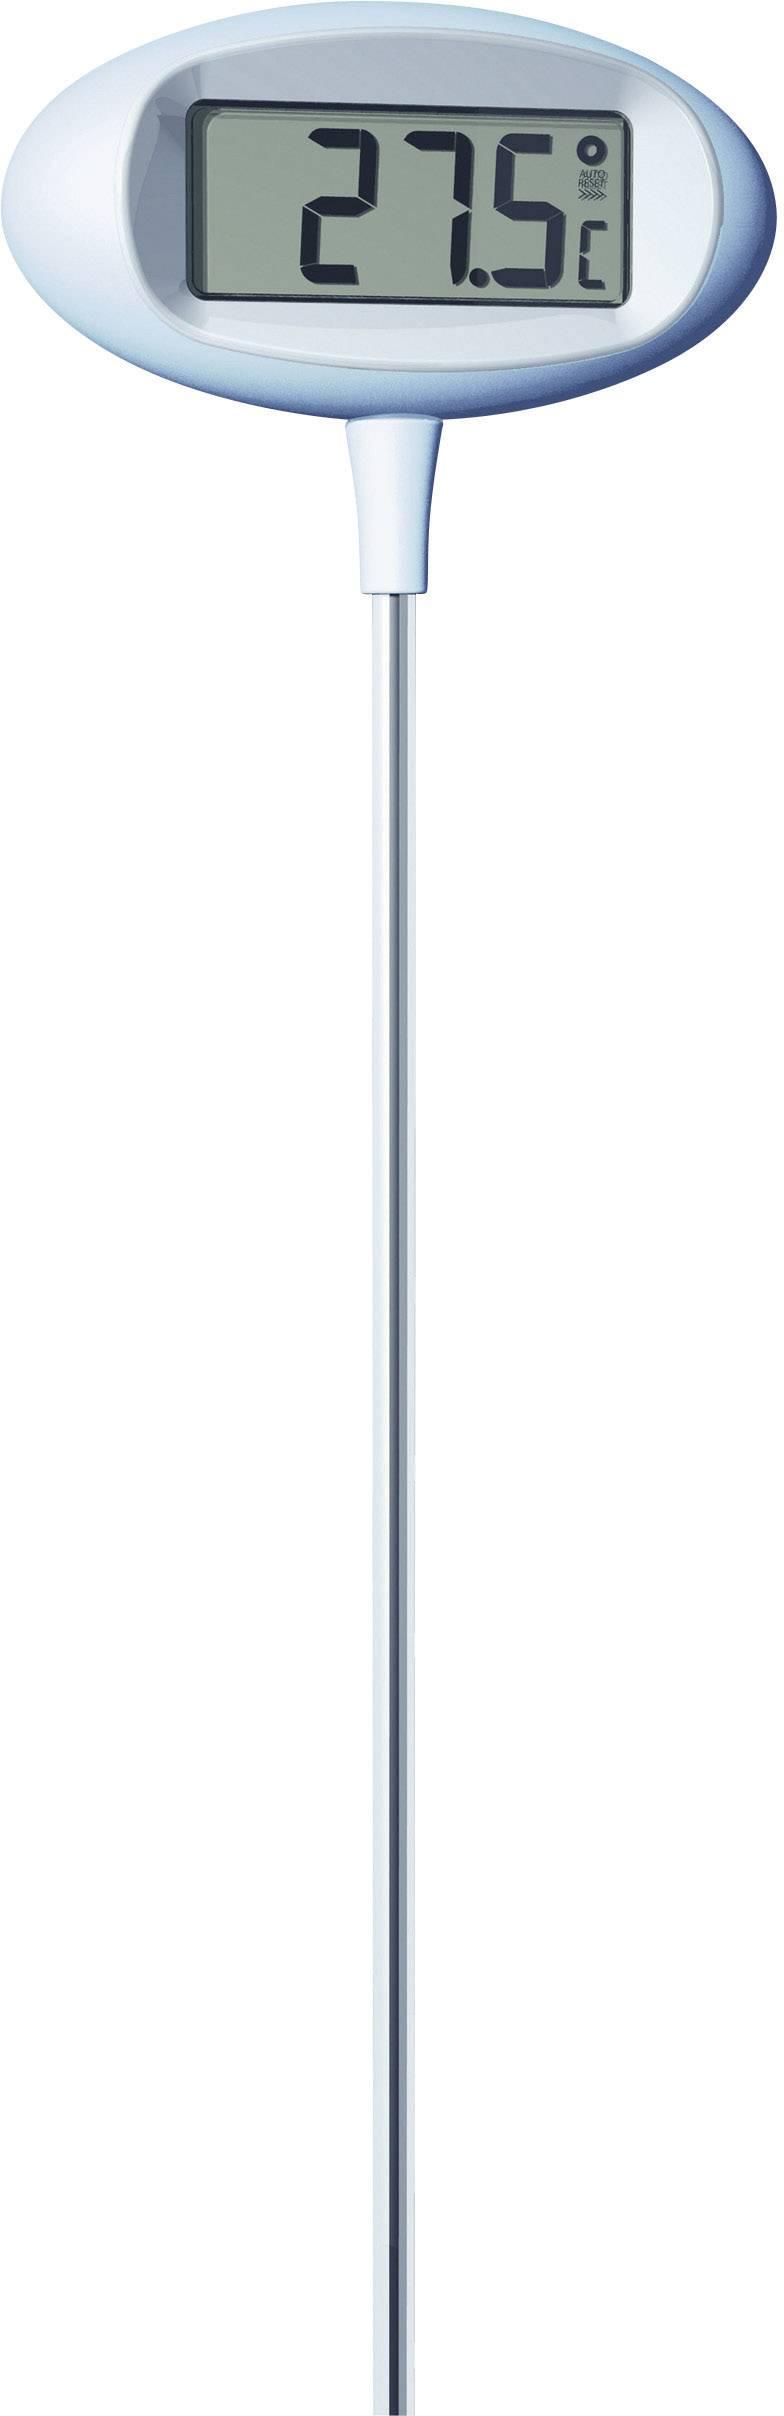 Wand Thermometer TFA 12.3023.02 Weiß